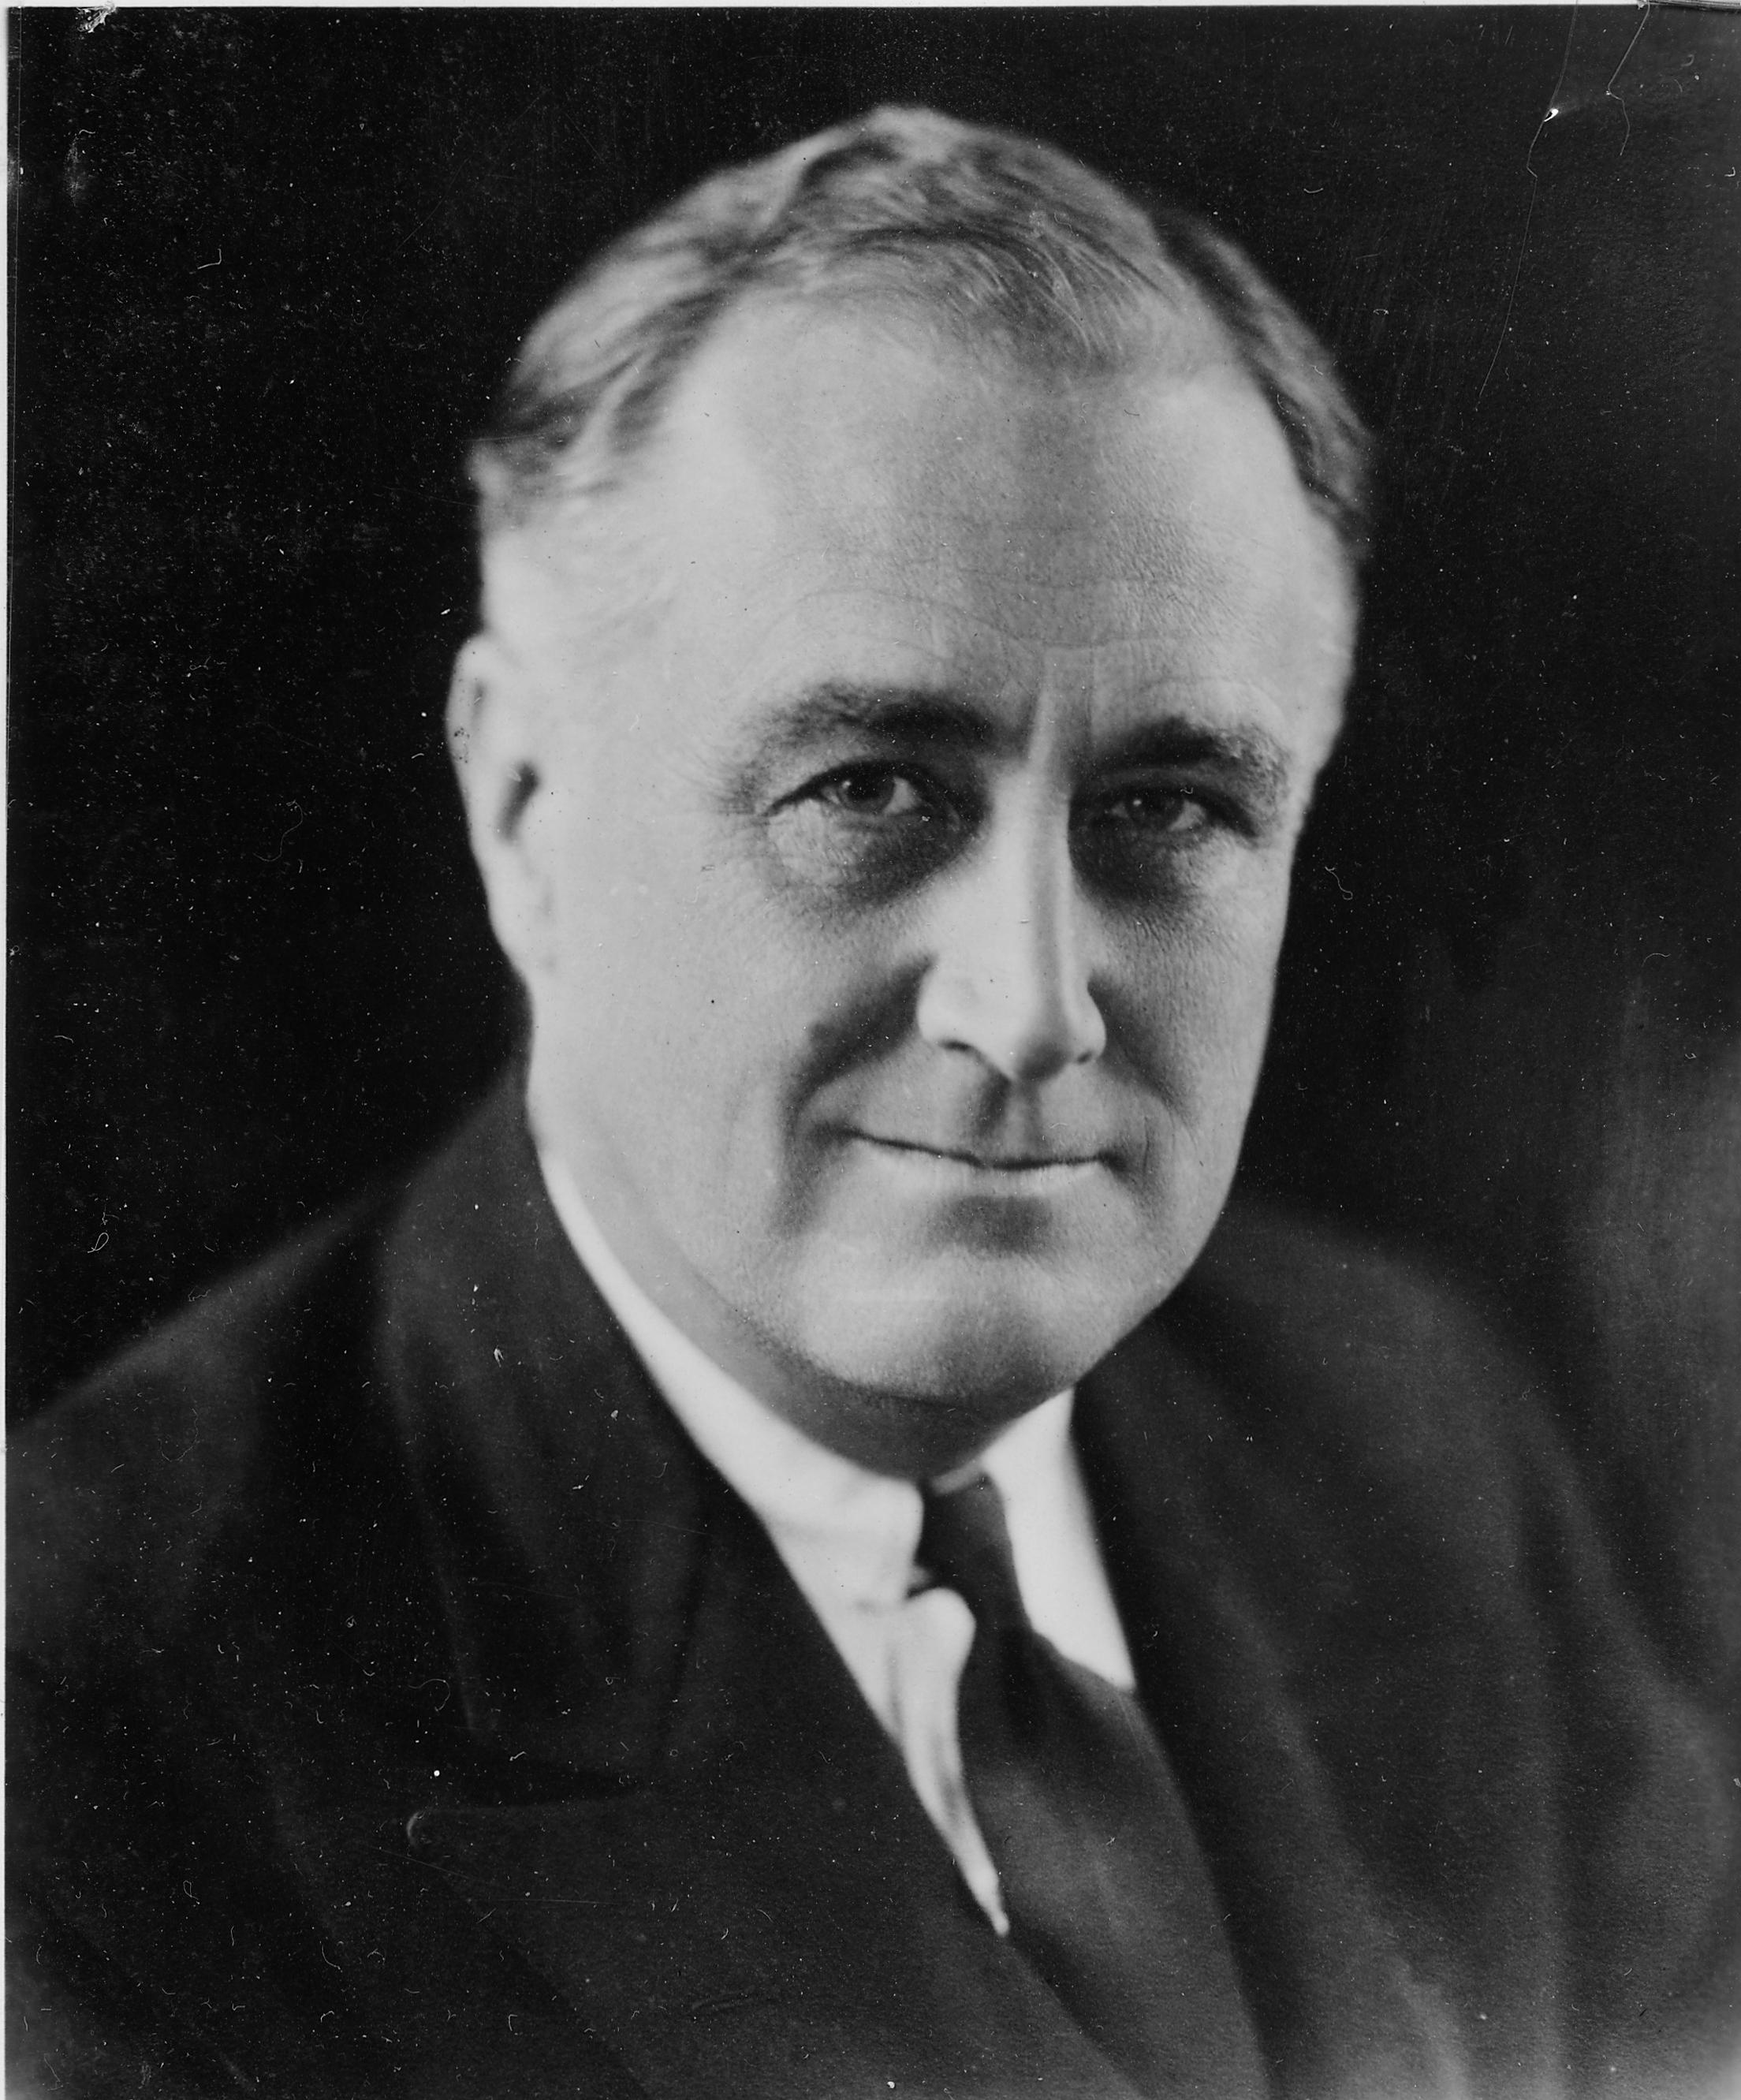 Franklin_D._Roosevelt_-_NARA_-_196715